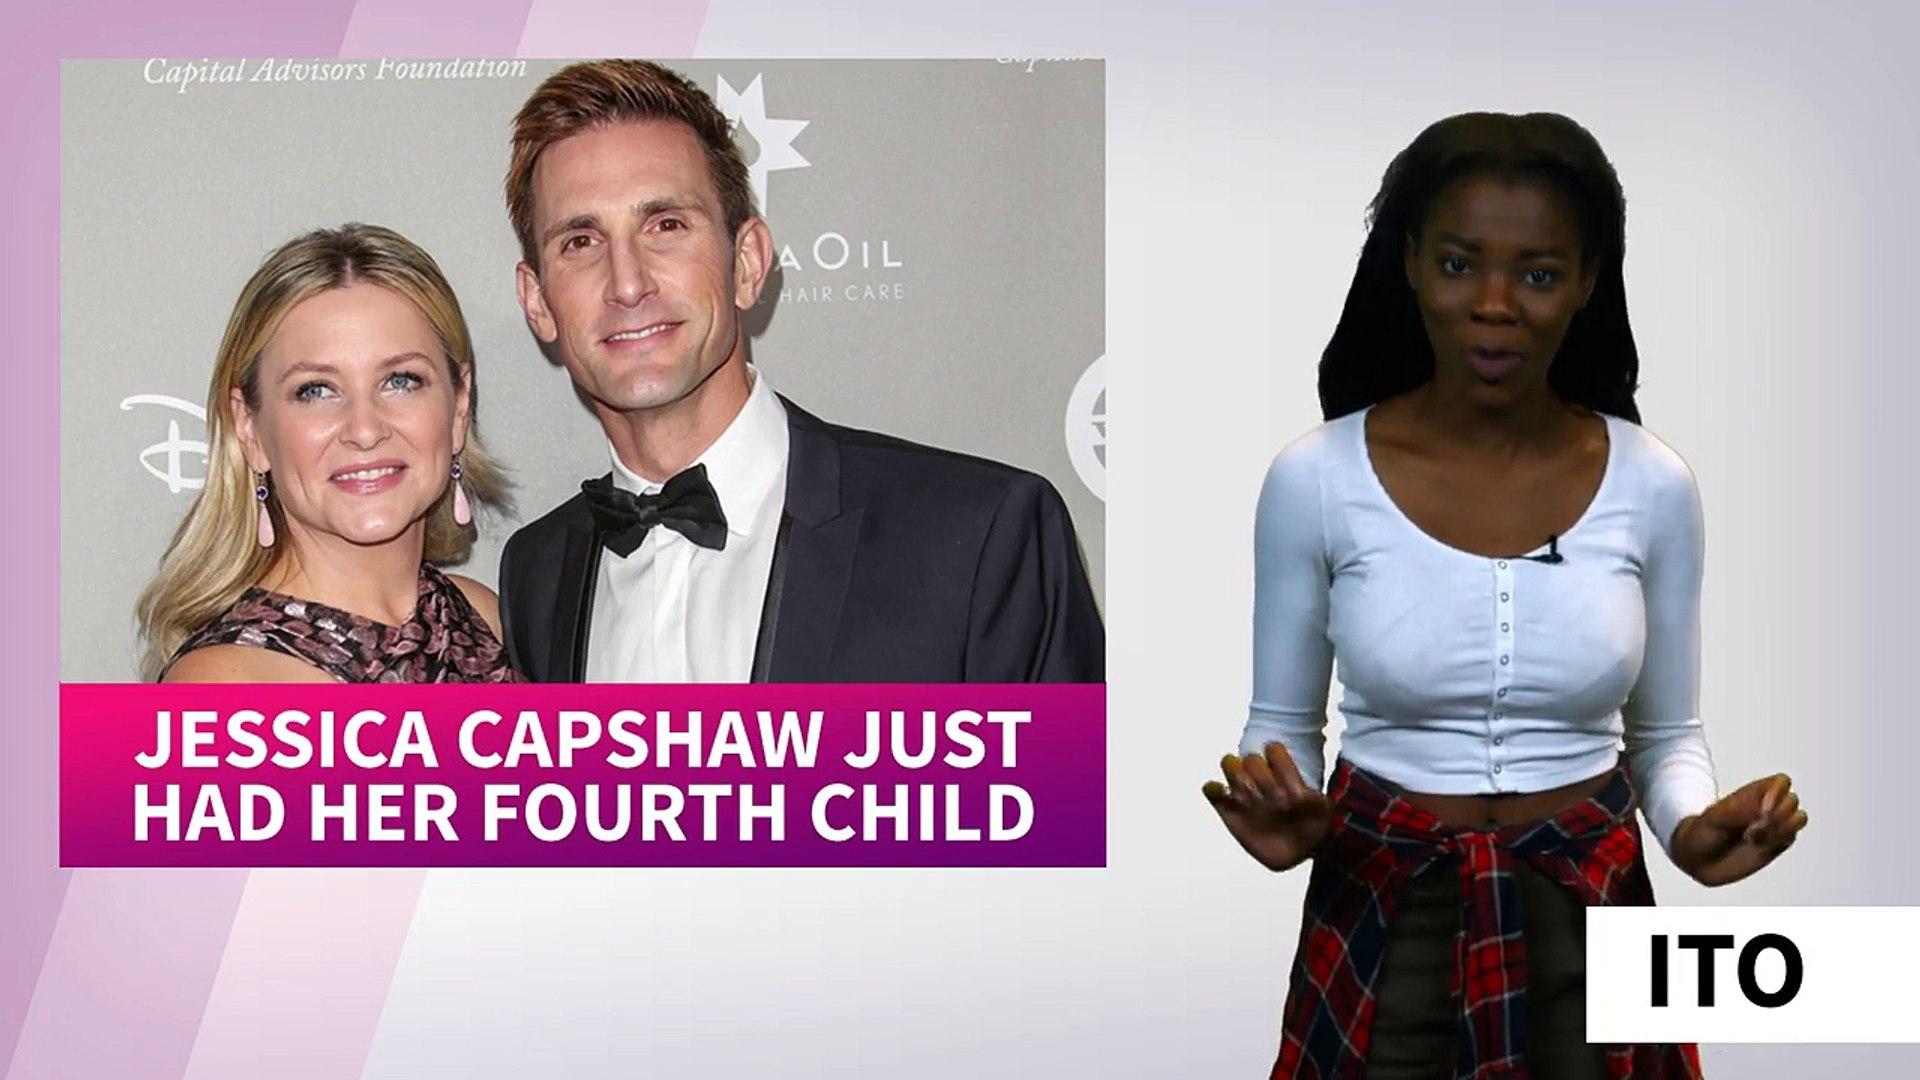 Jessica Capshaw And Husband Christopher Gavigan Welcome Fourth Child